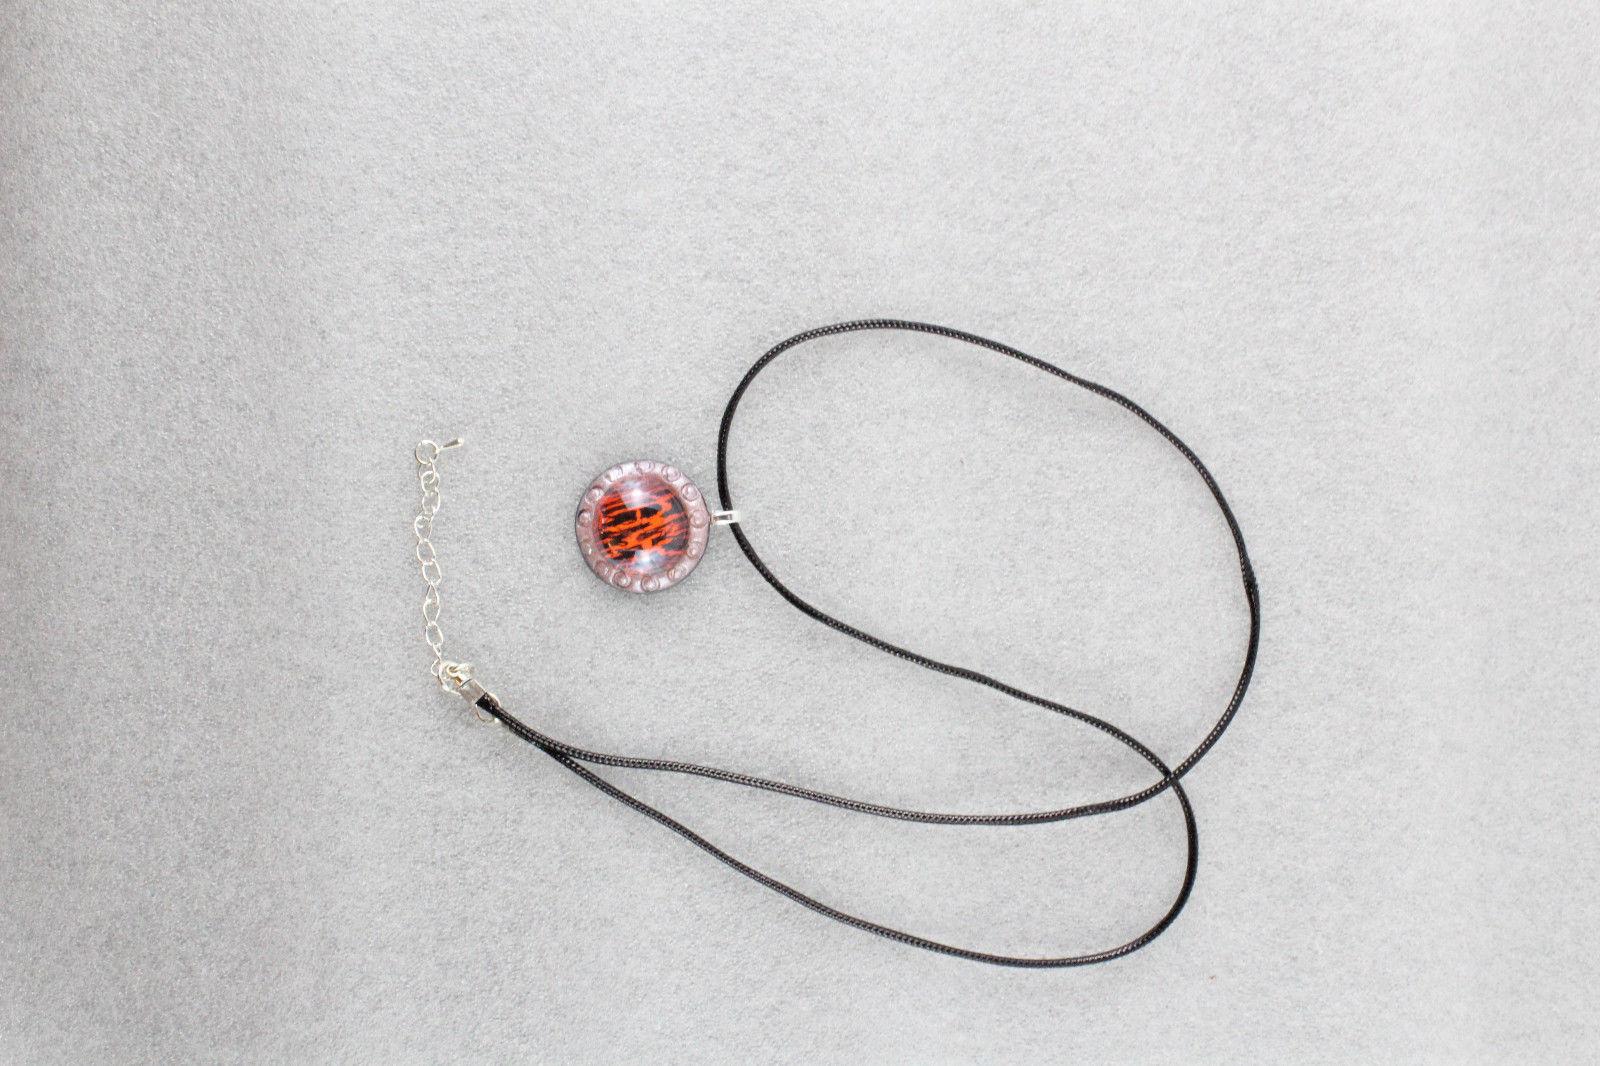 Elegant Handmade Cabochon & Premo Clay Pendant Necklace + Cord & Extension #015